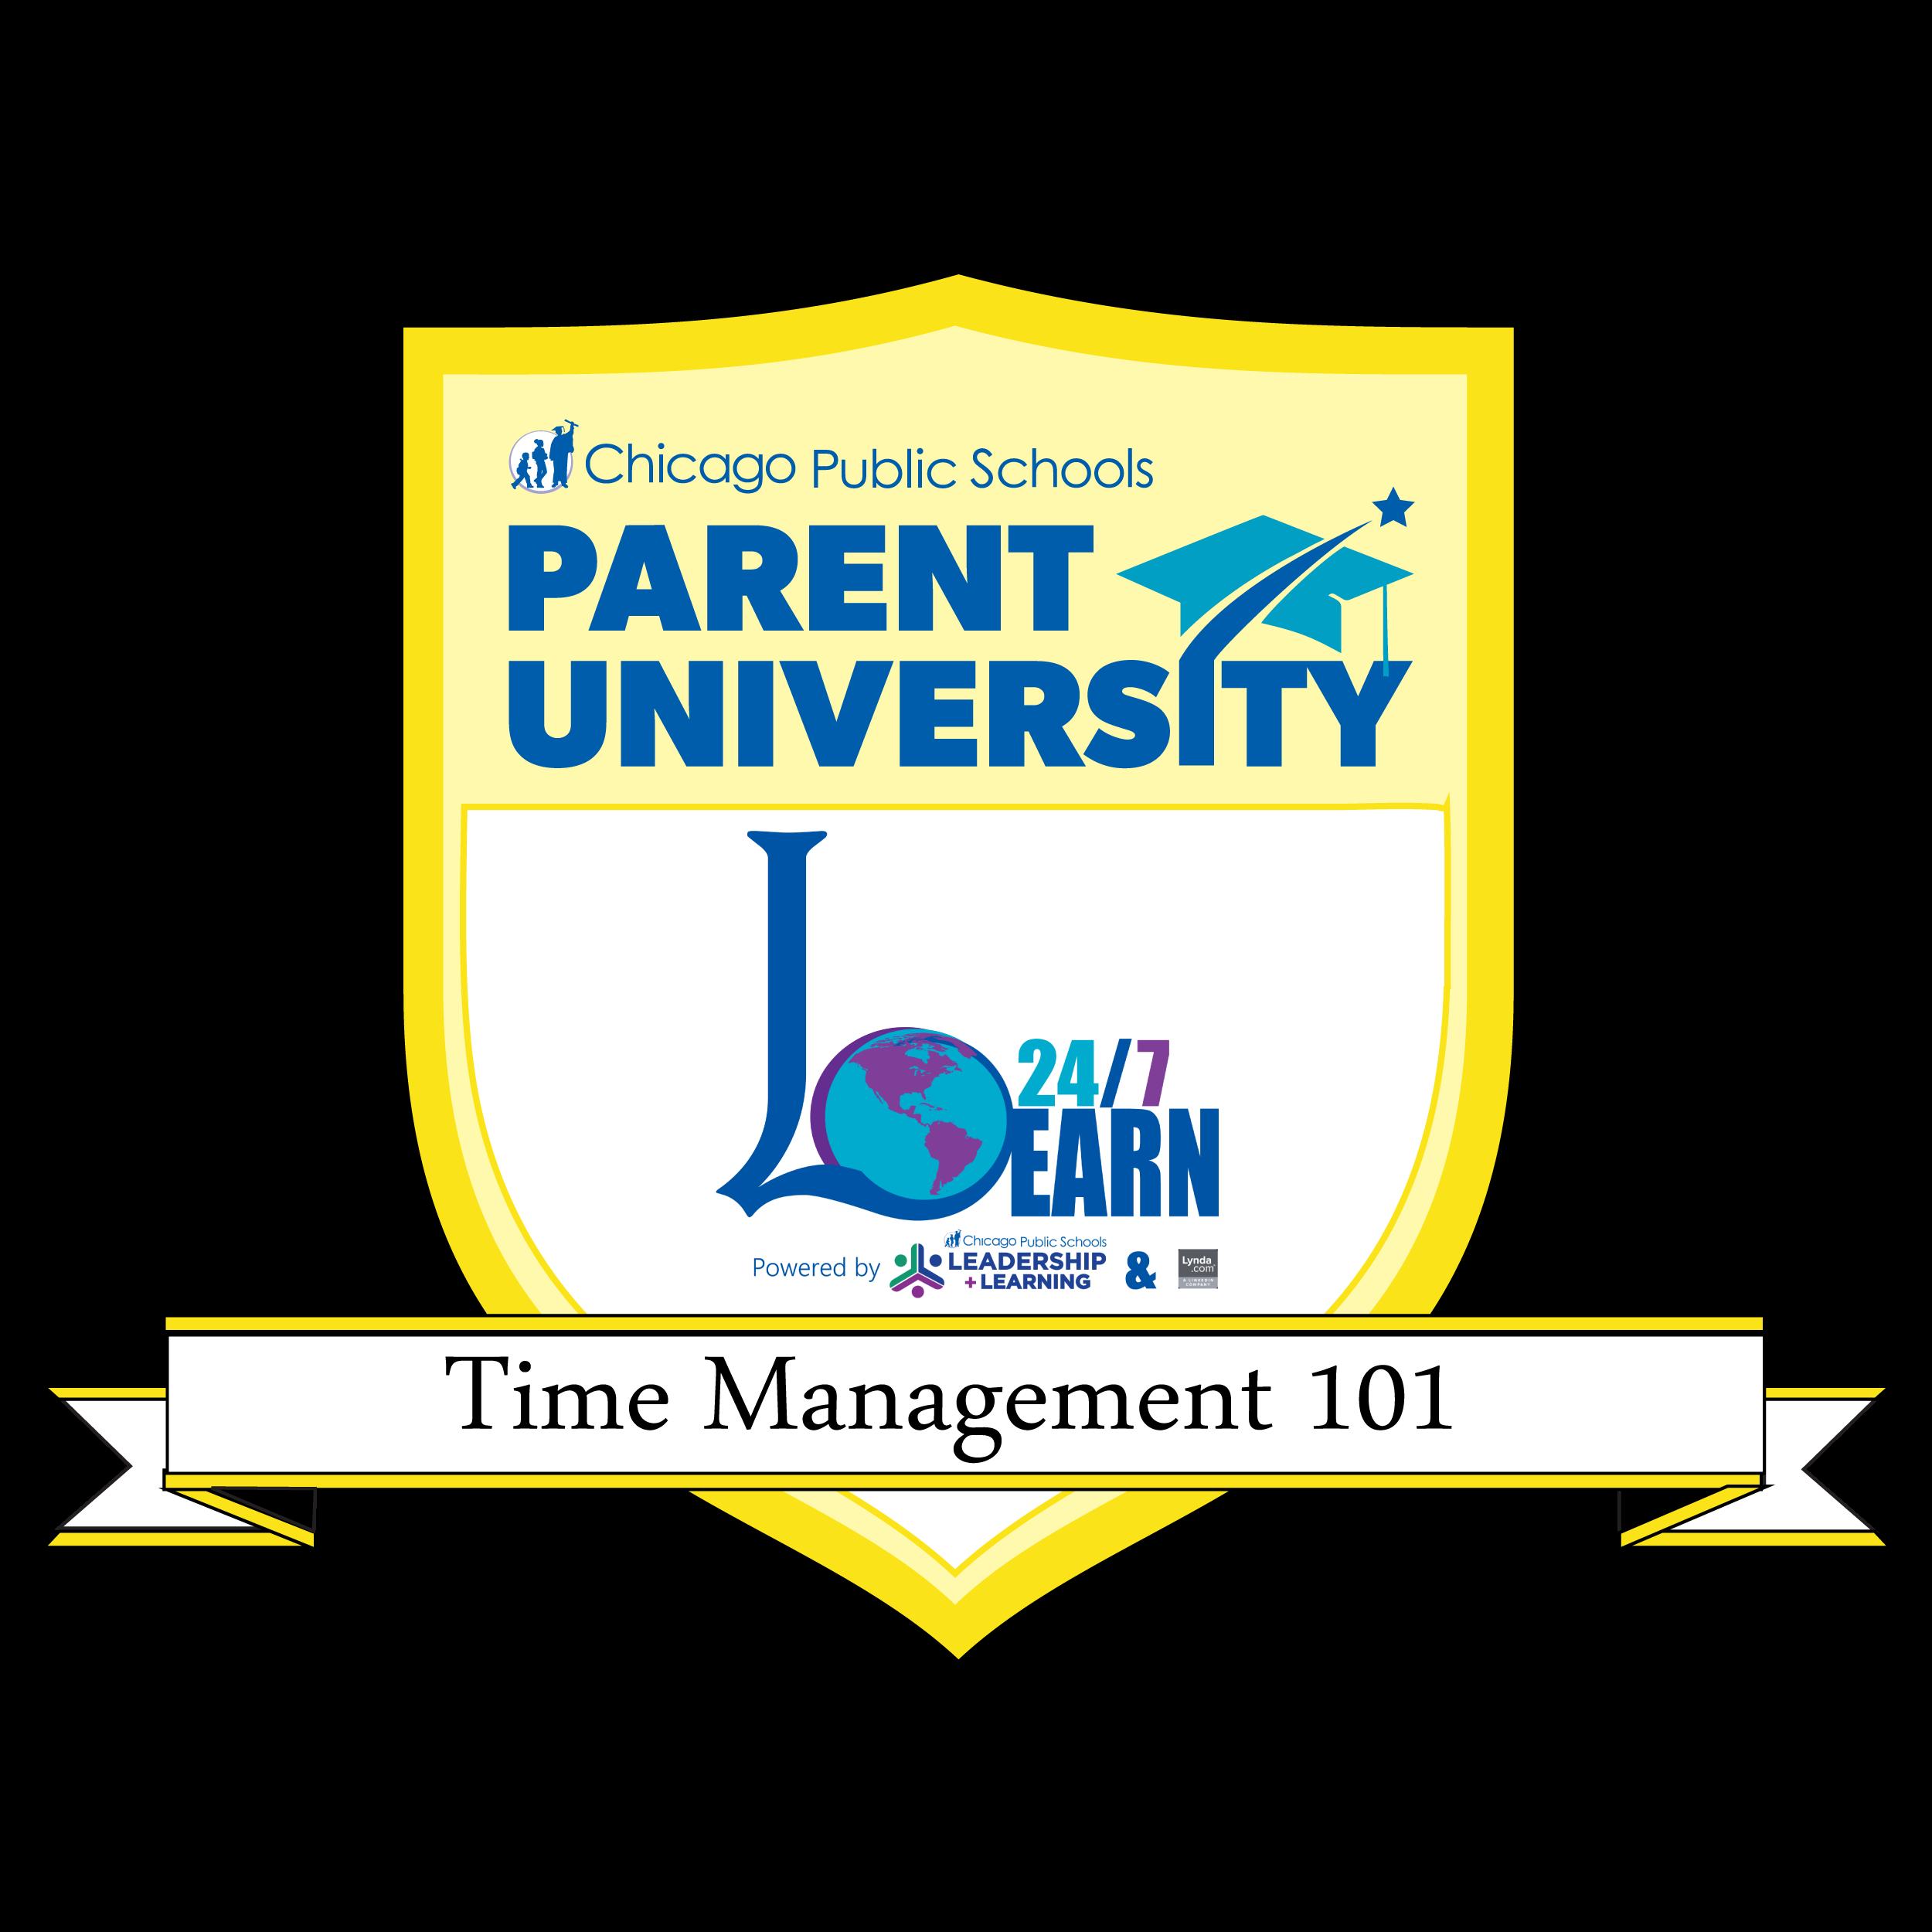 Time Management 101